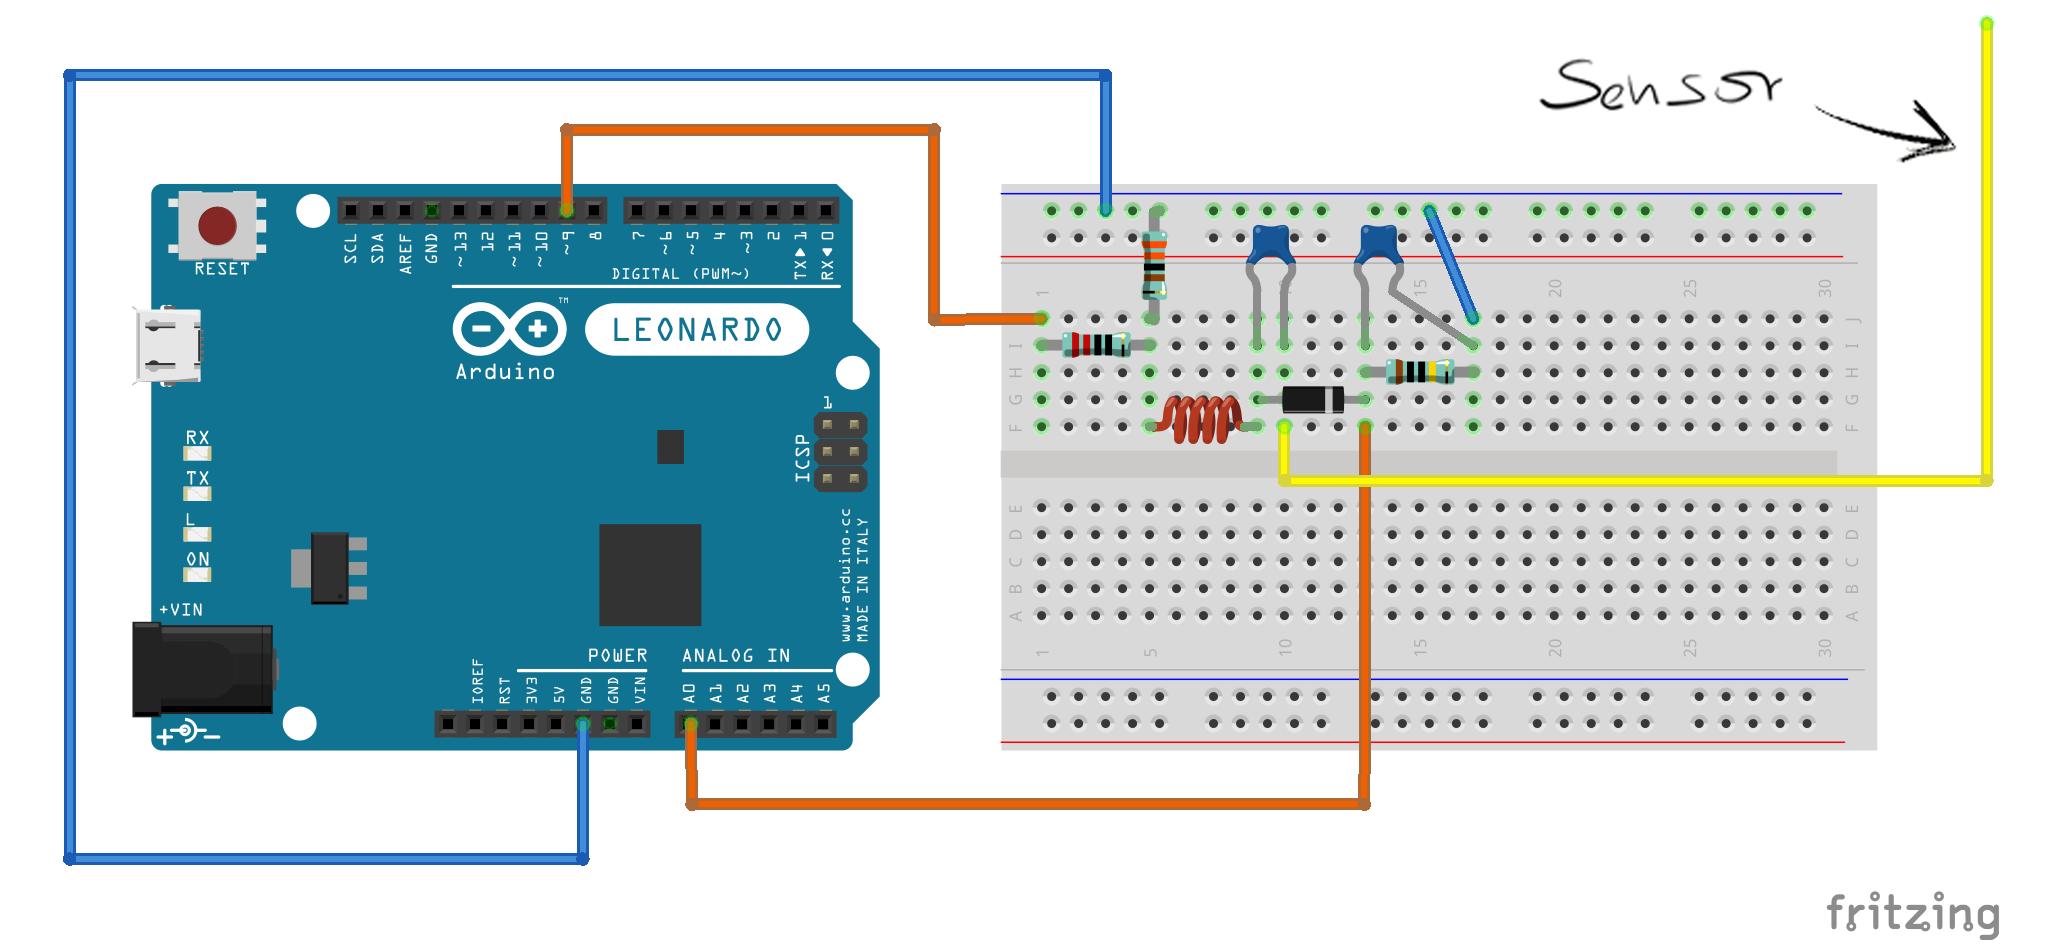 Breadboard setup for Tact single sensor